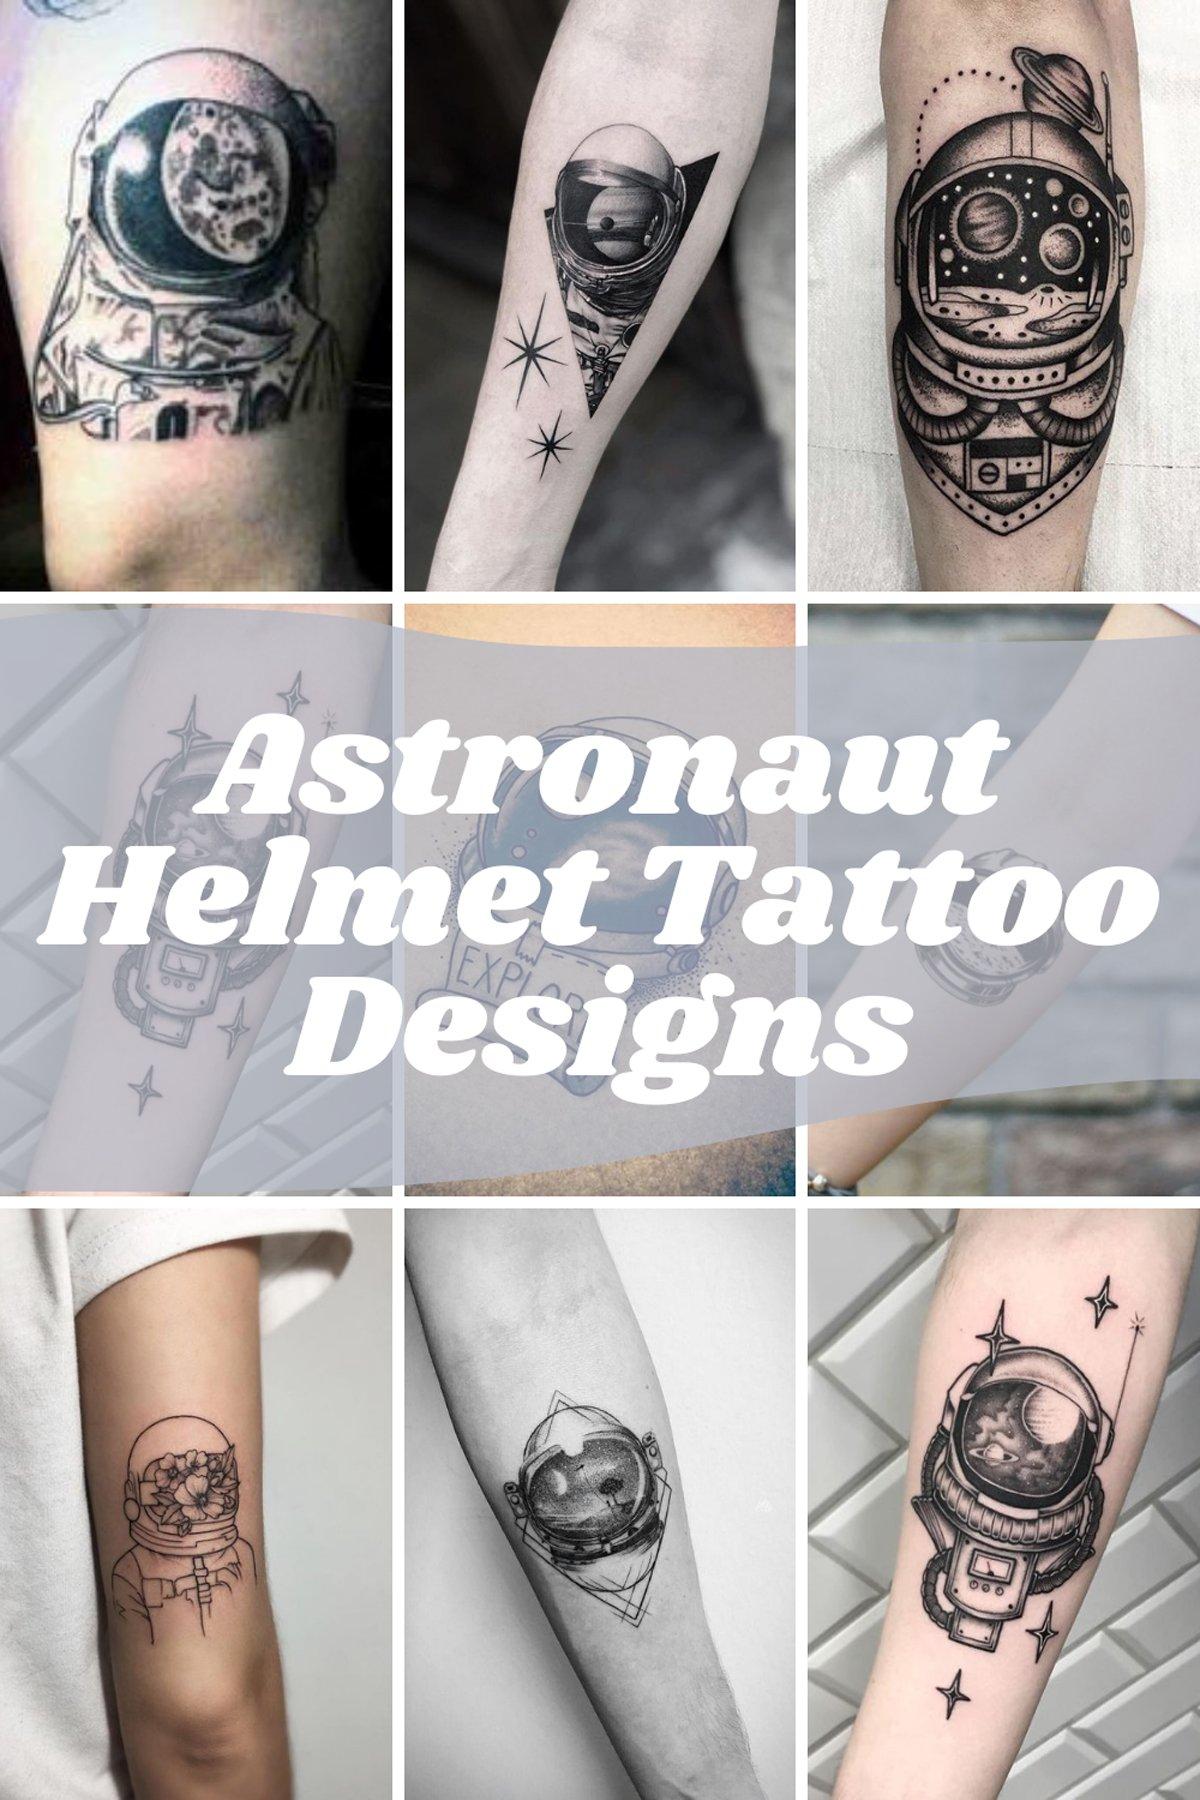 Astronaut Helmet Tattoo Designs